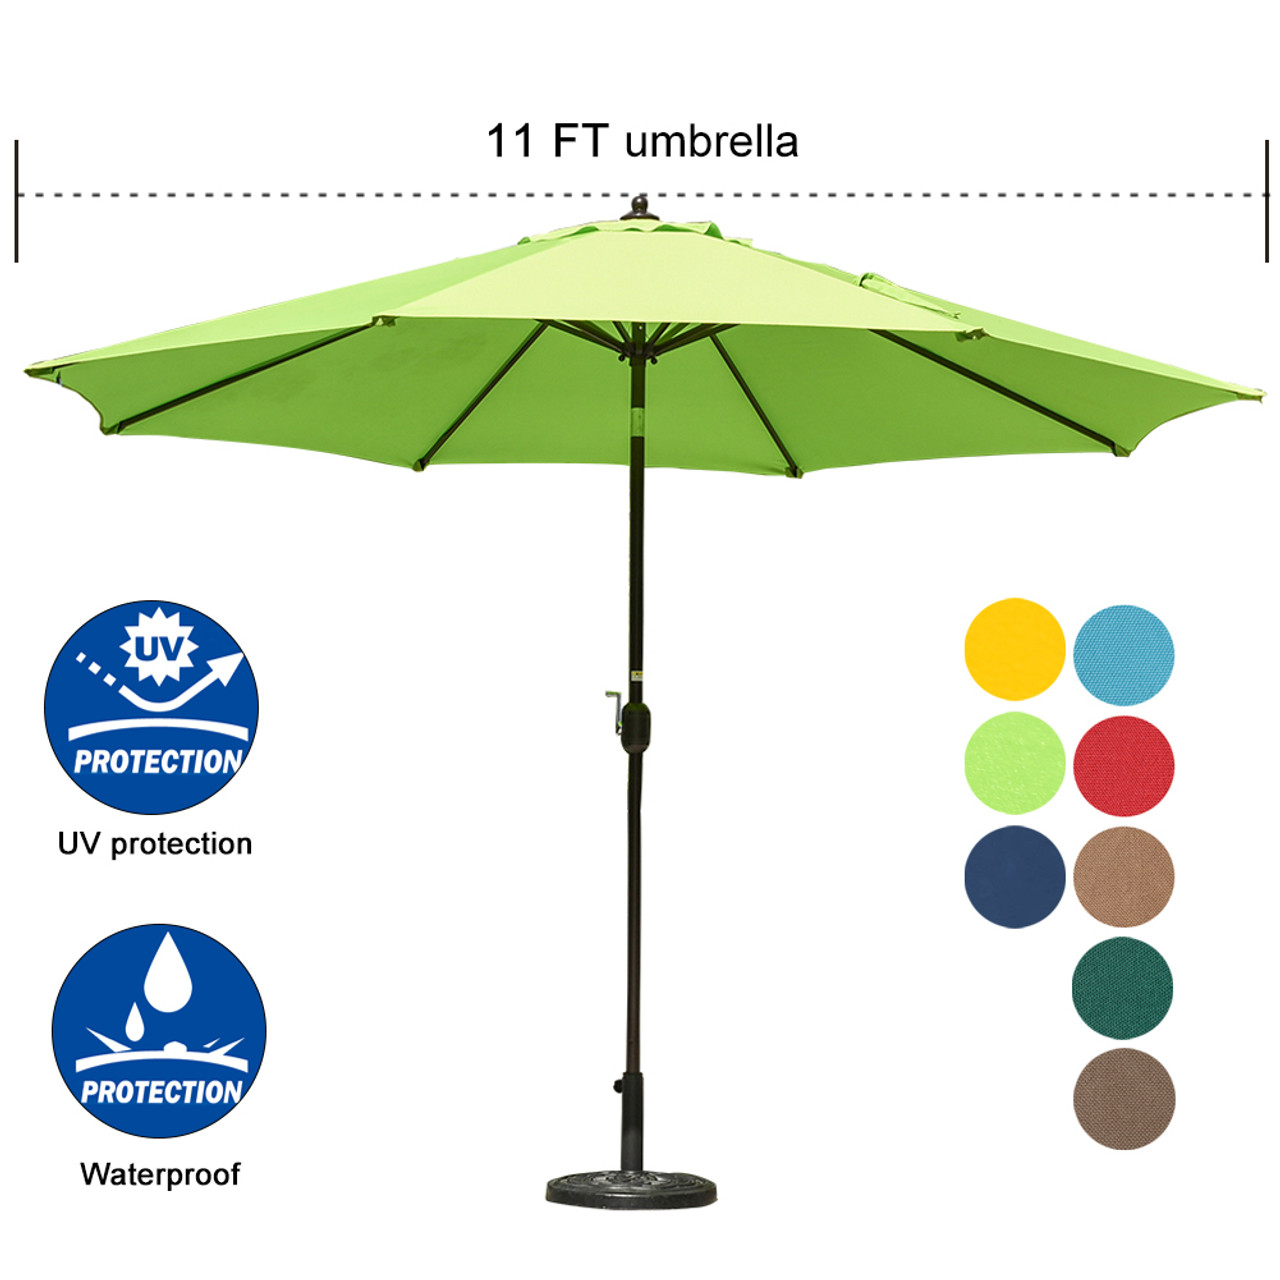 e3ef9c94bdc5 Sundale Outdoor 11 ft Aluminum Patio Umbrella Table Market Umbrella with  Crank and Push Button Tilt for Garden, Deck, Backyard, Pool, 8 Steel Ribs,  ...